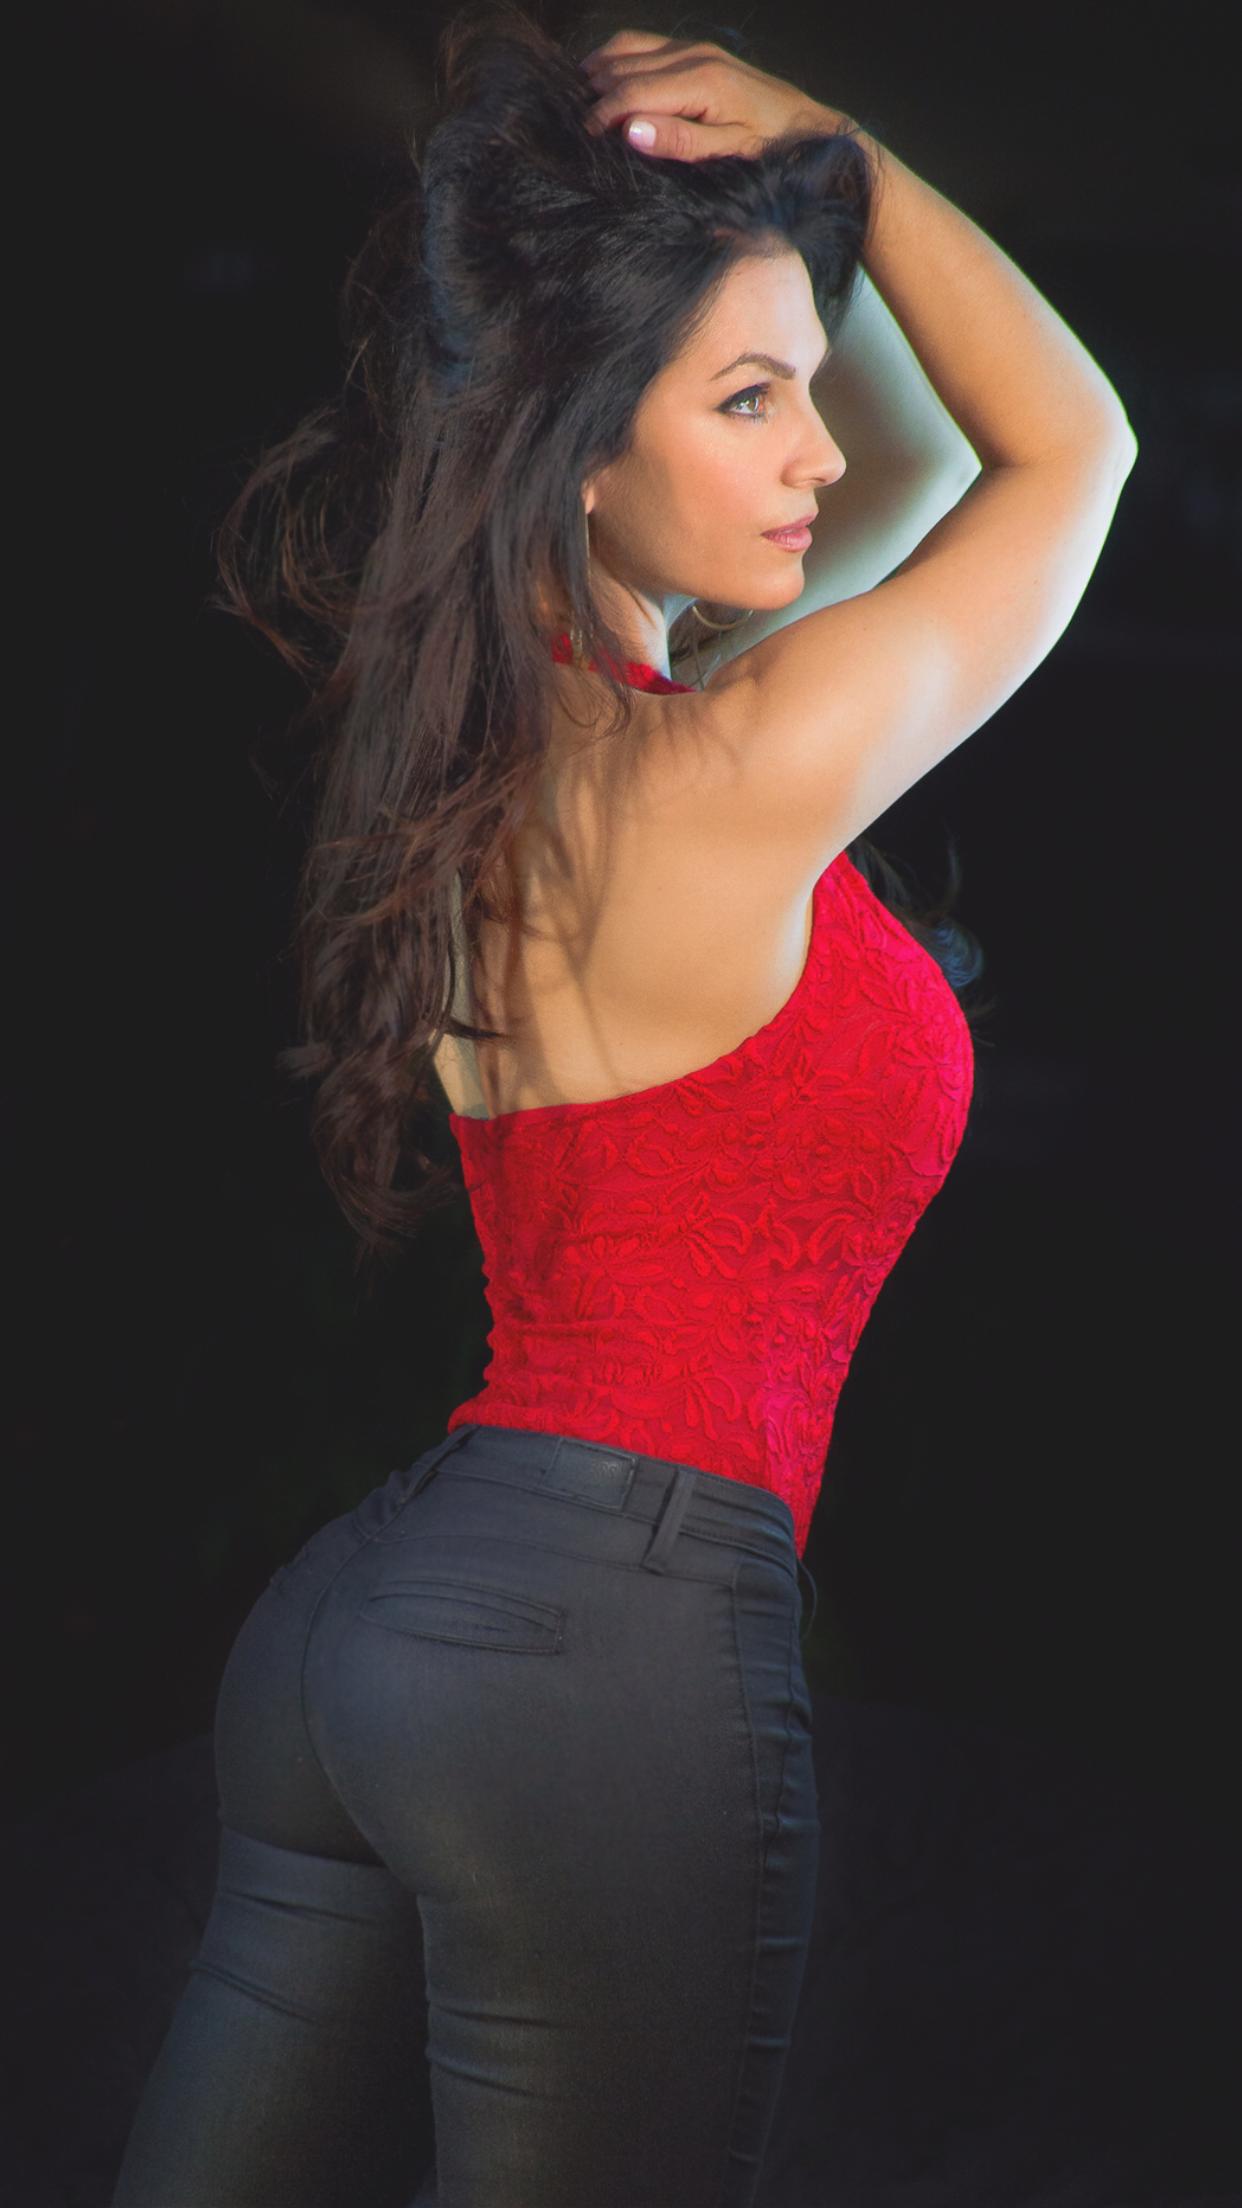 Denise Milani Modeling Pictures Pinterest Glamour